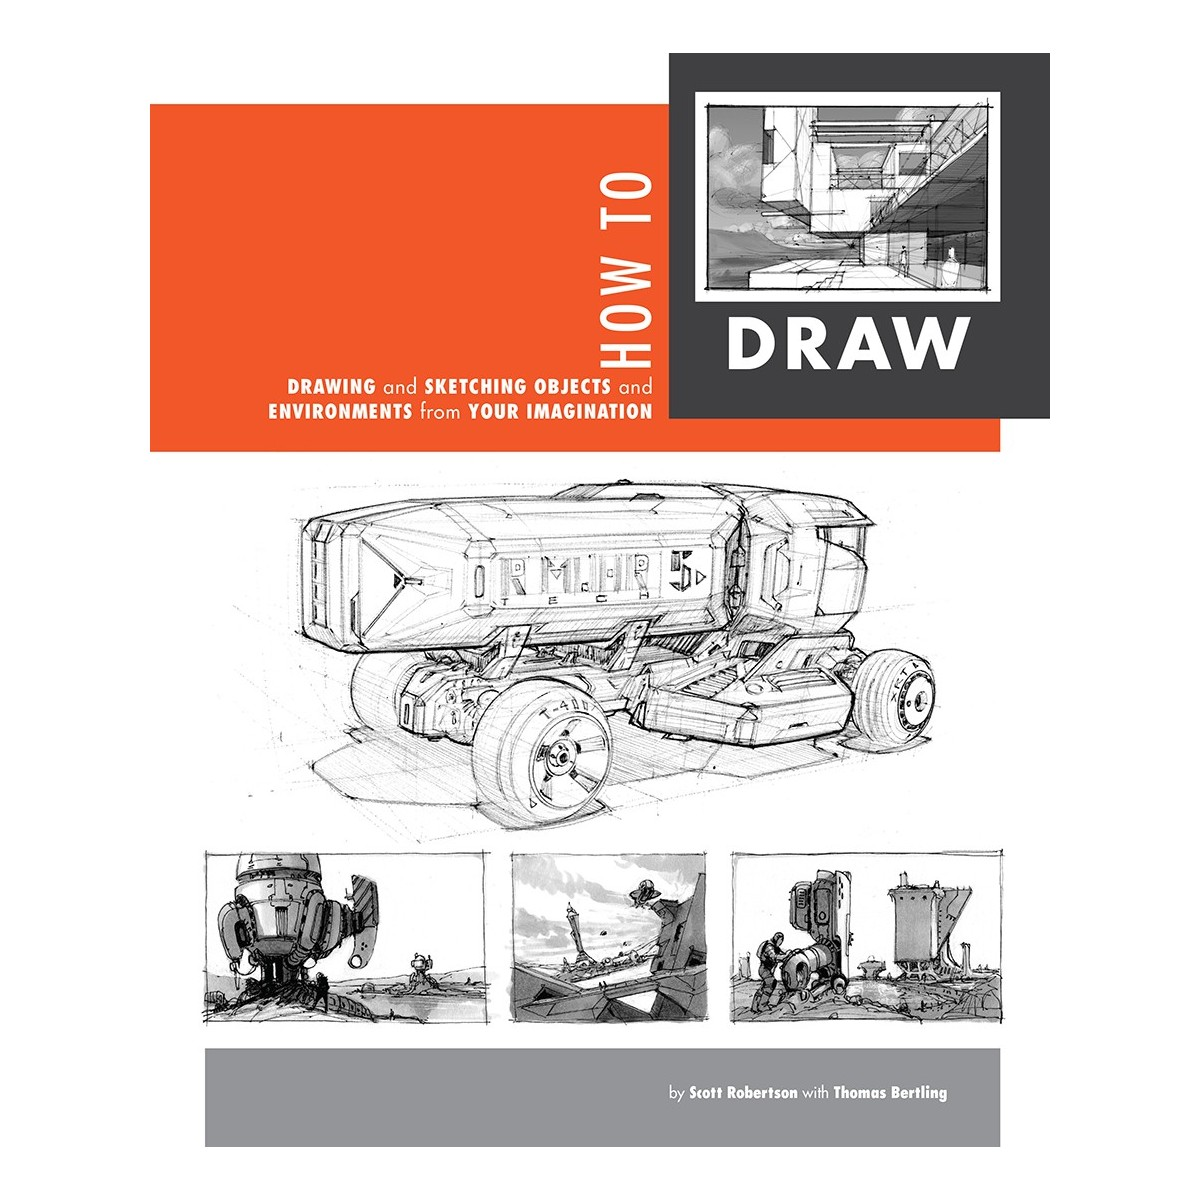 Scott Robertson et Thomas Bertling - How To Draw